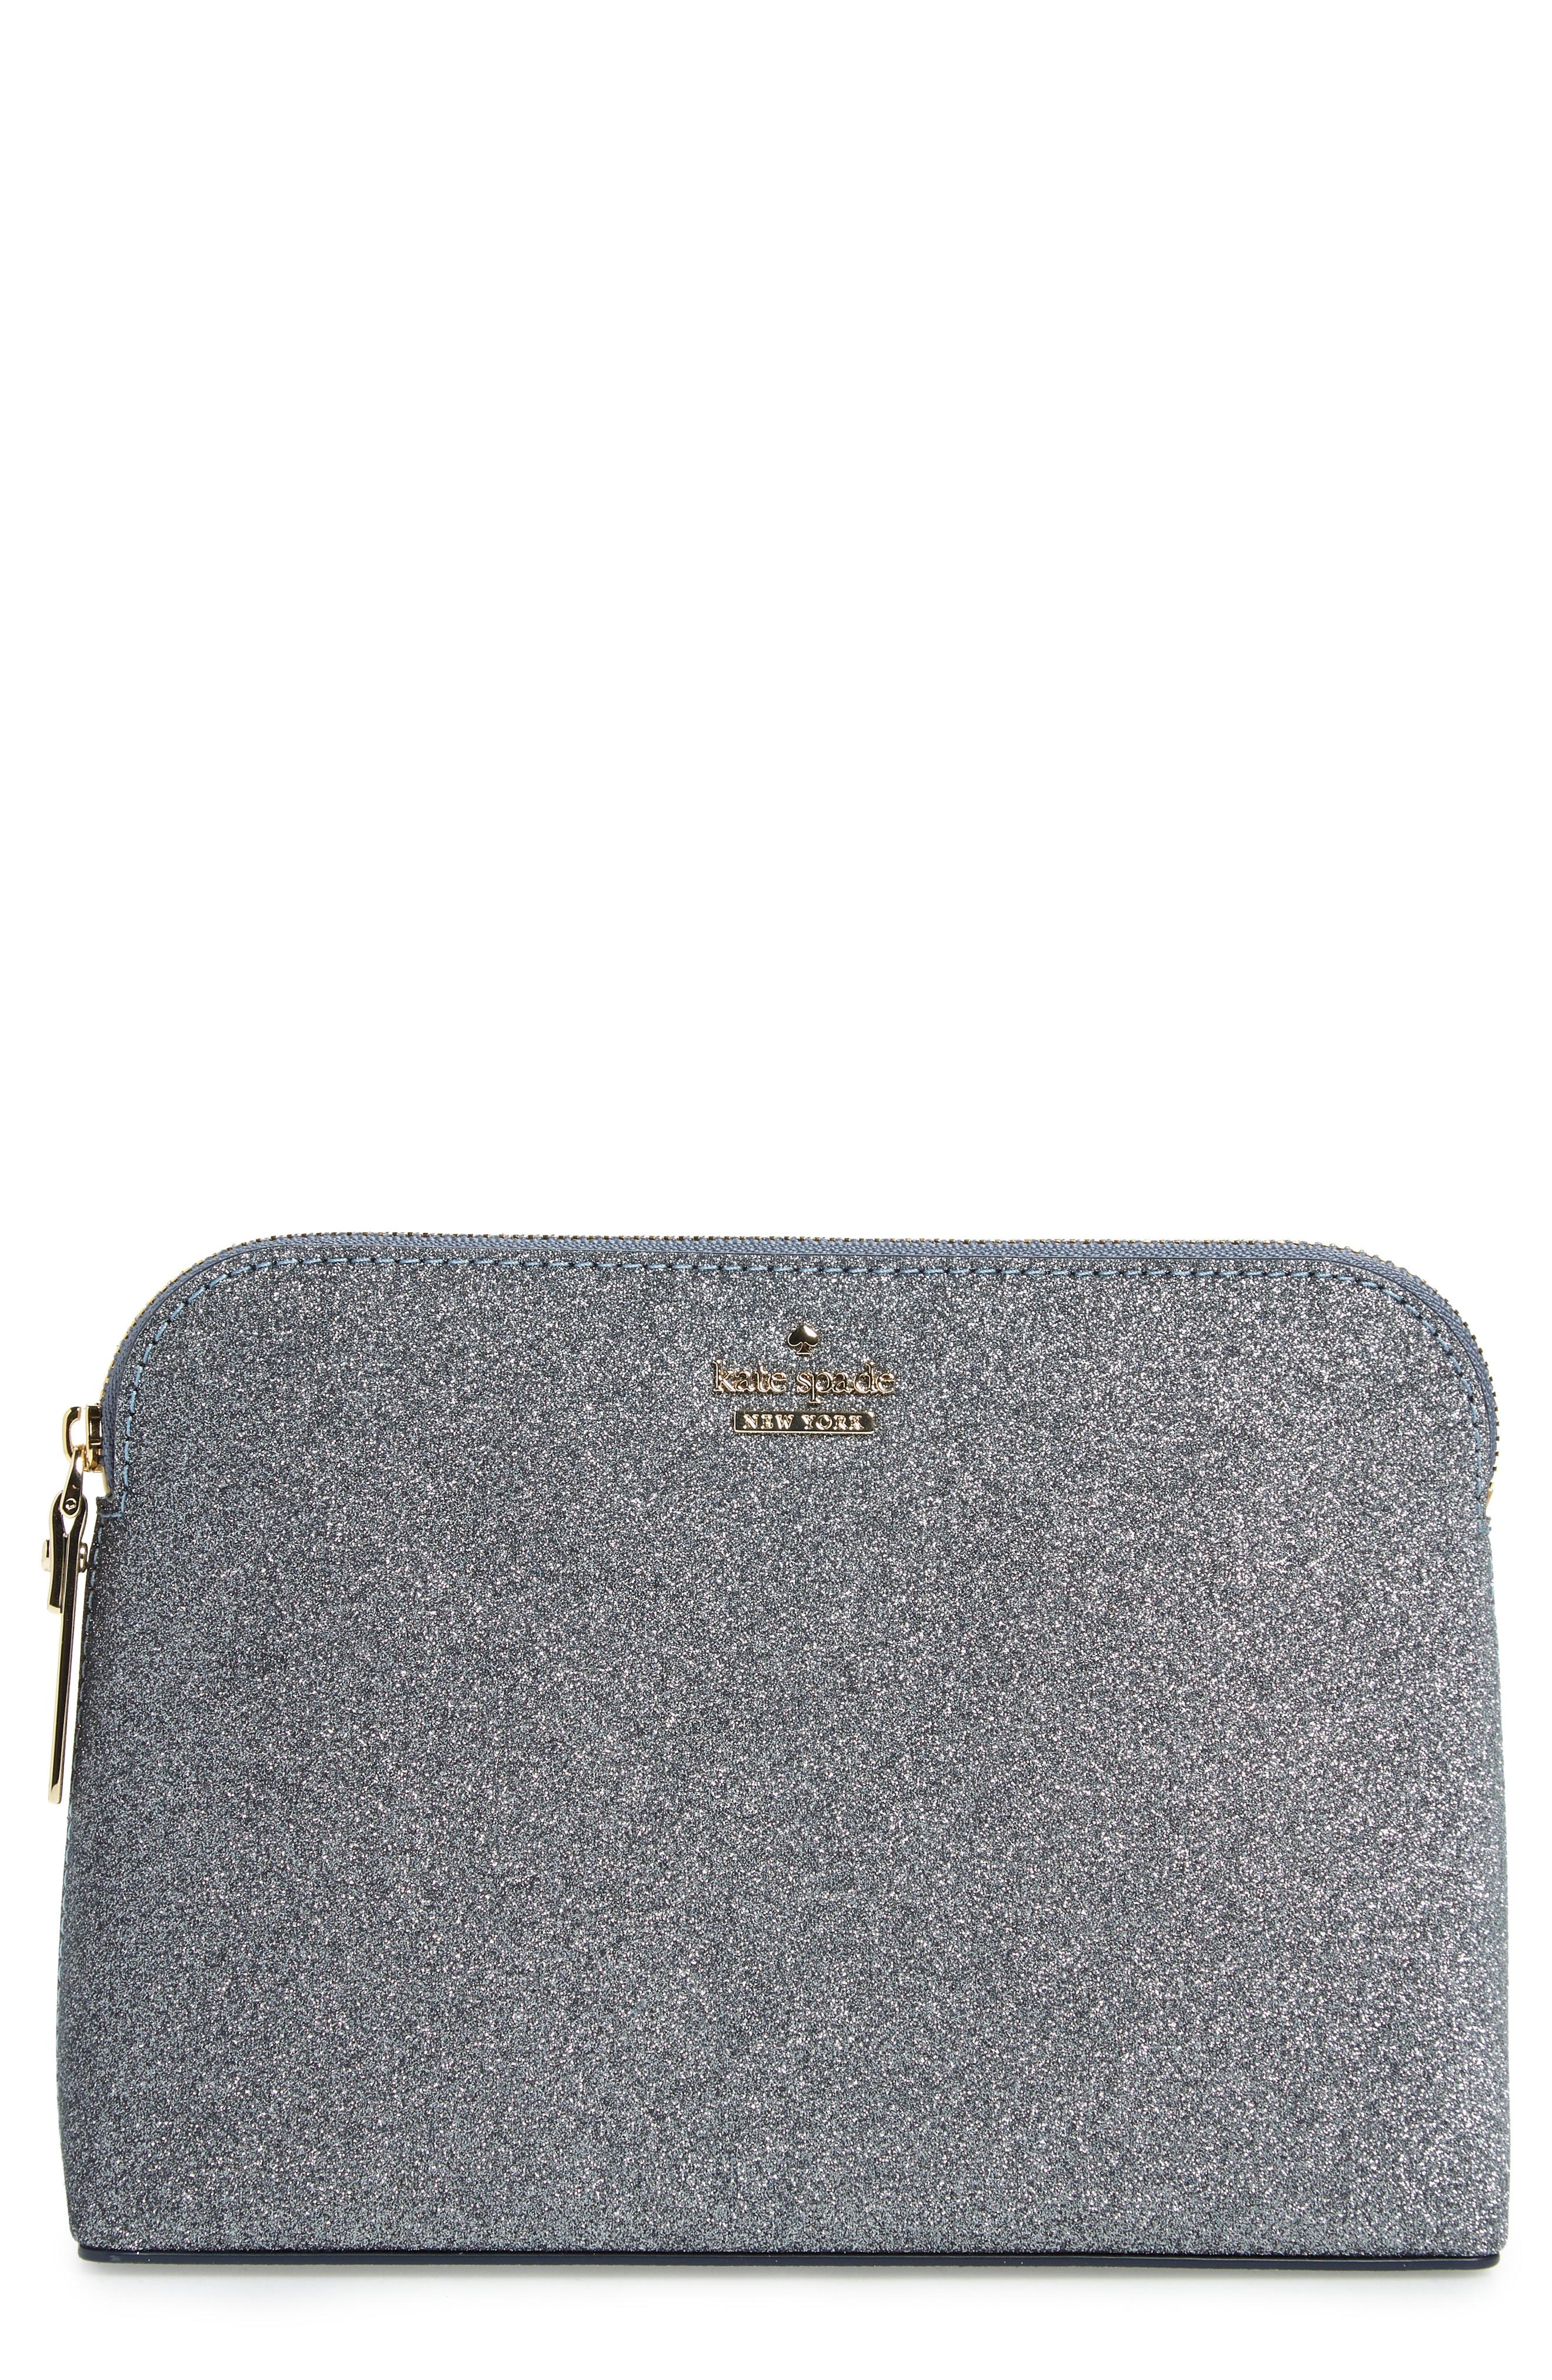 kate spade new york burgess court - small briley cosmetics bag